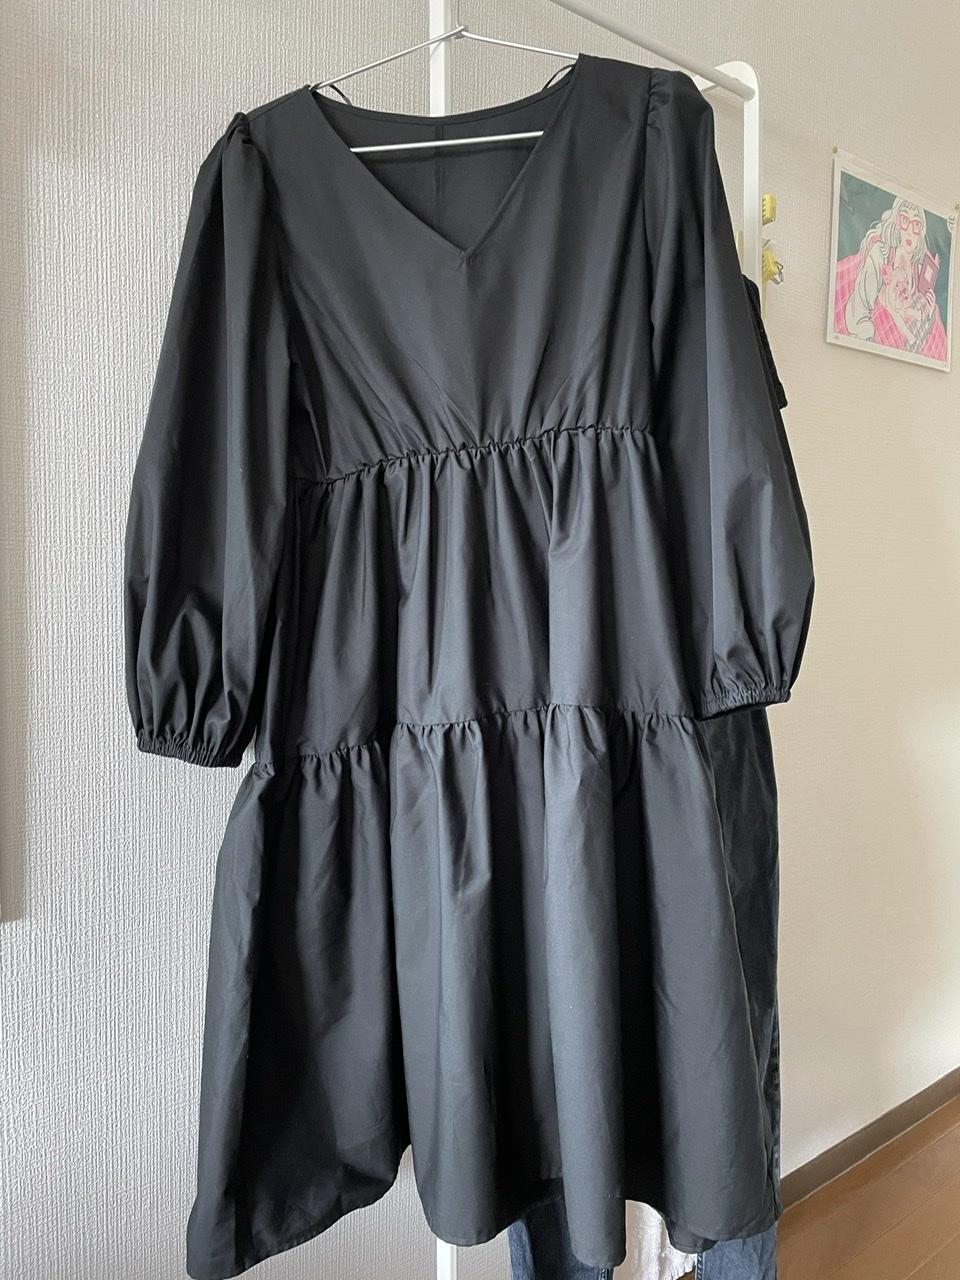 【GU】黒のティアードワンピで大人っぽ春コーデ_1